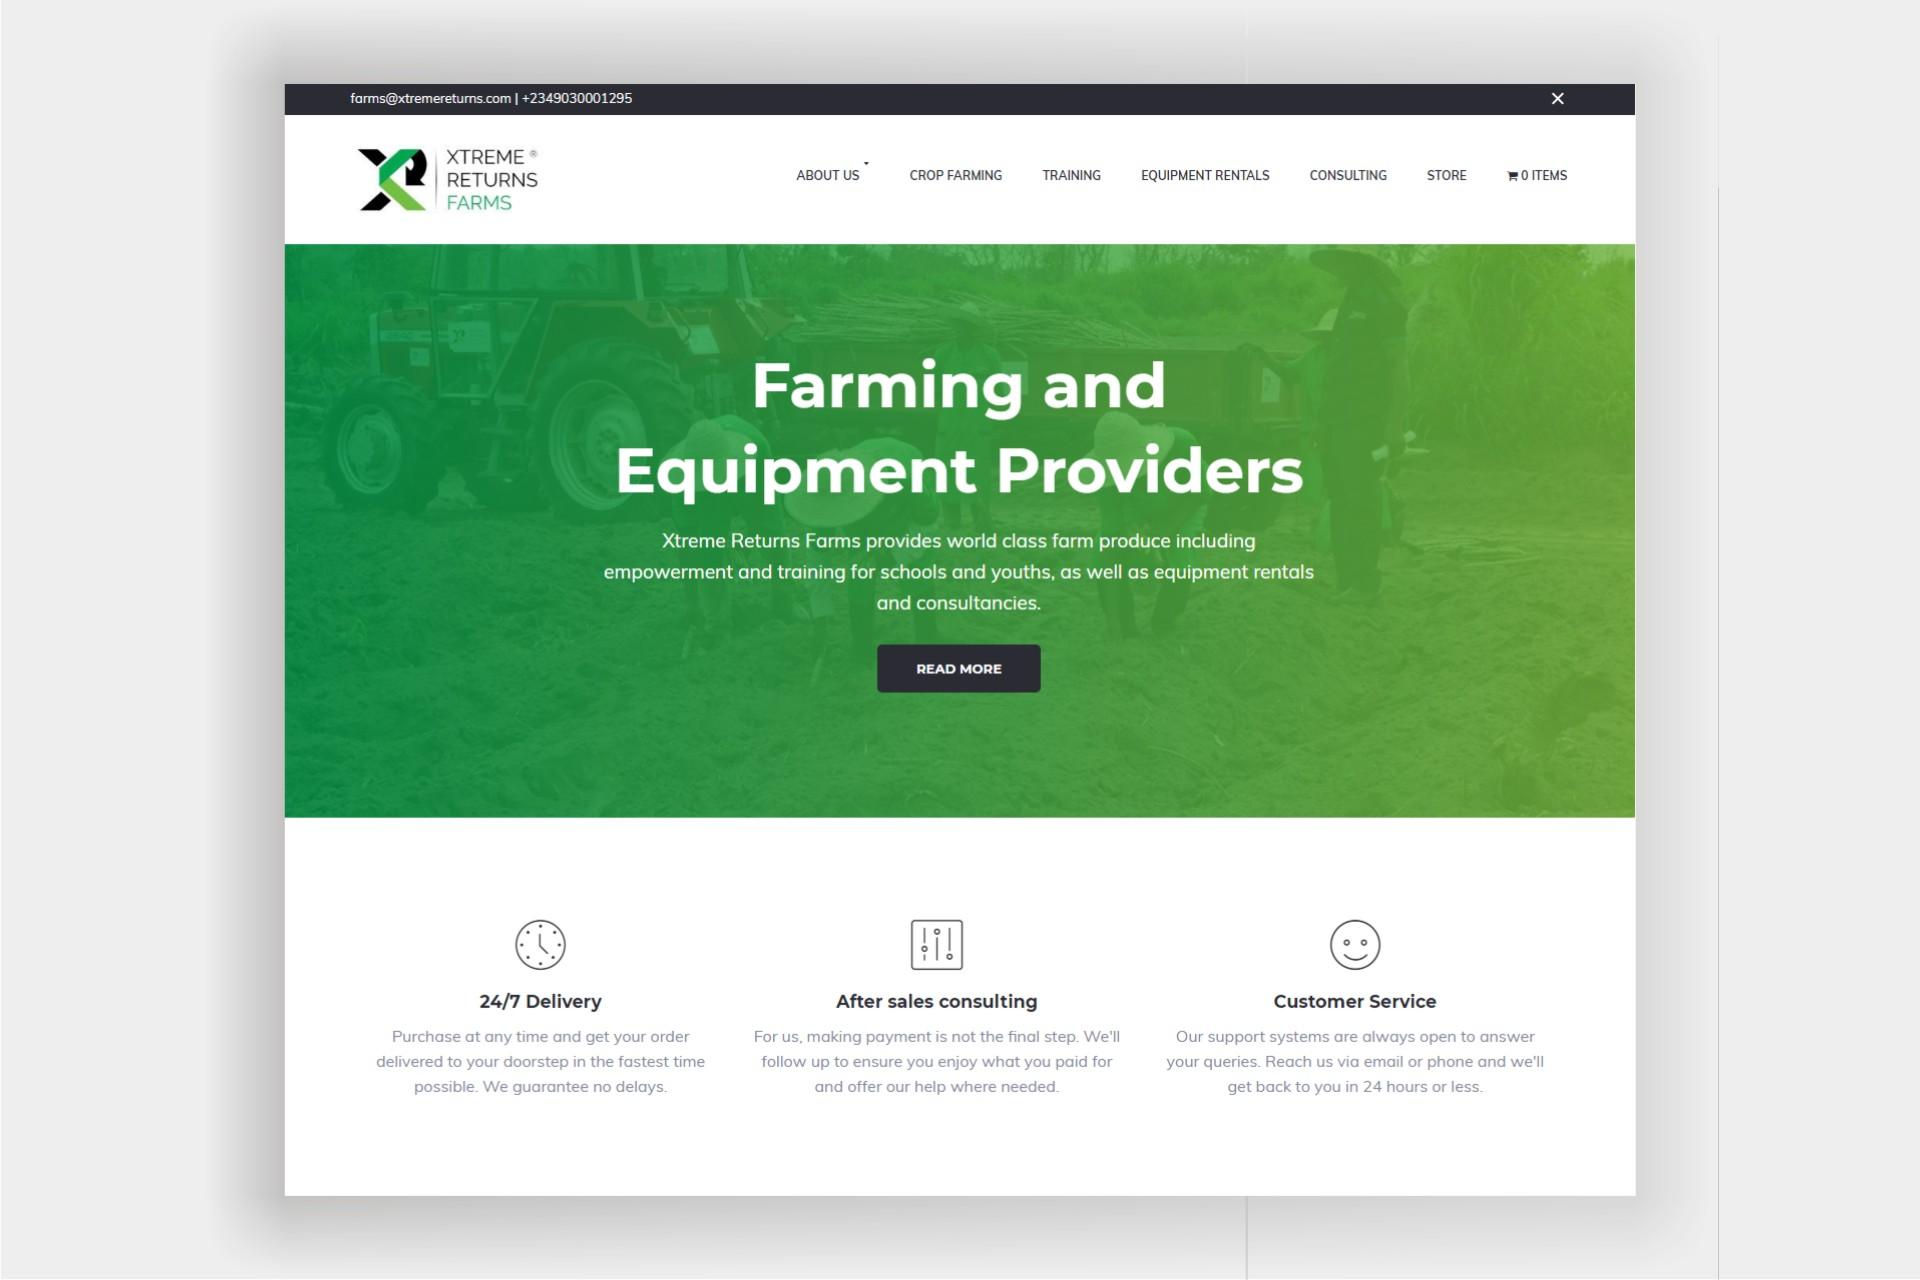 Xtreme Returns website